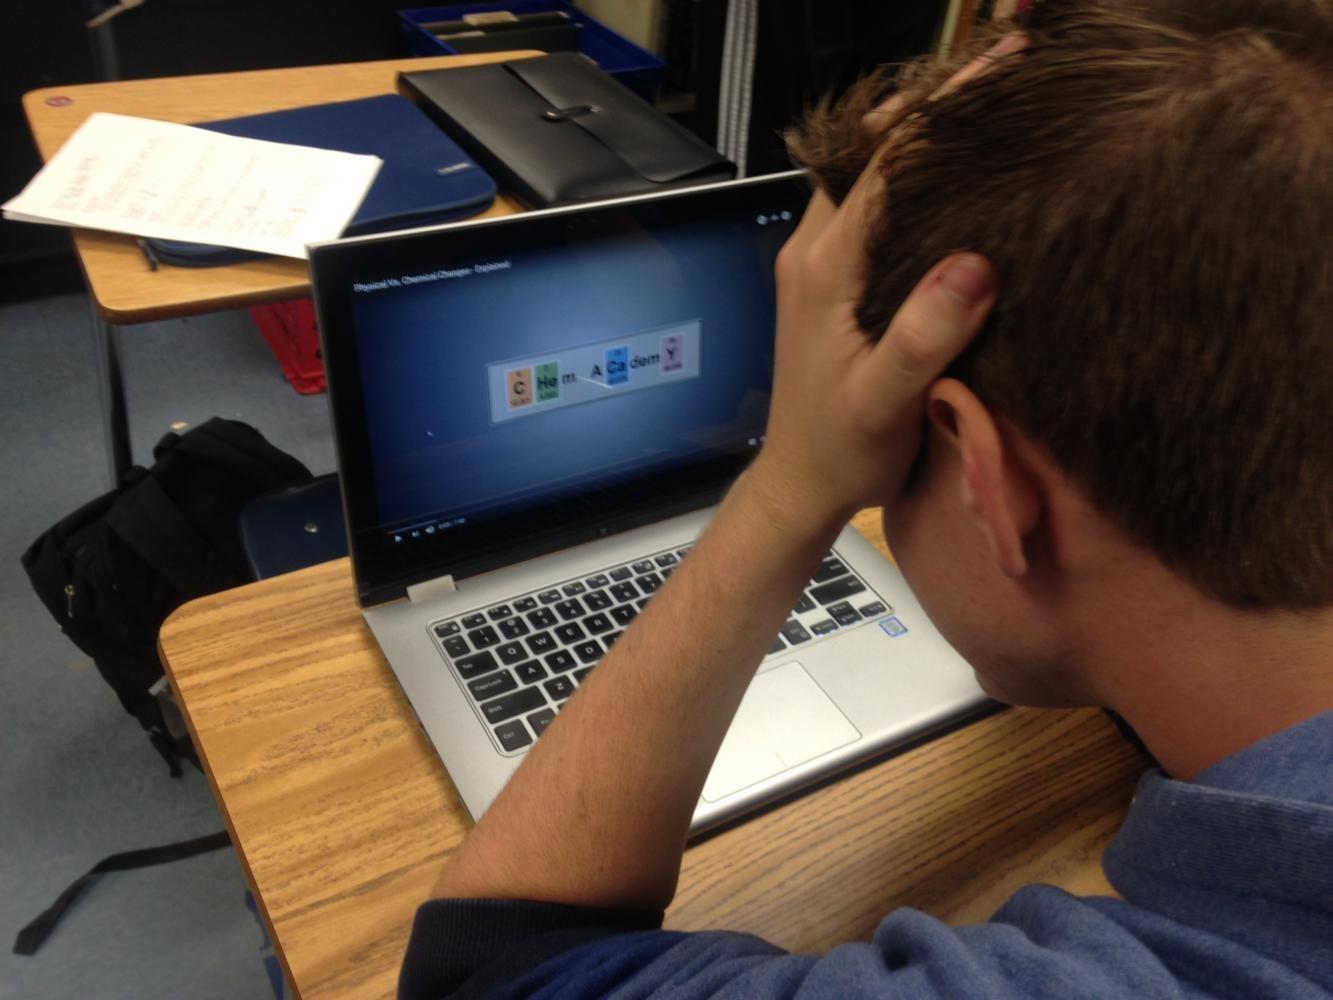 Casey Swafford frets over online chemistry